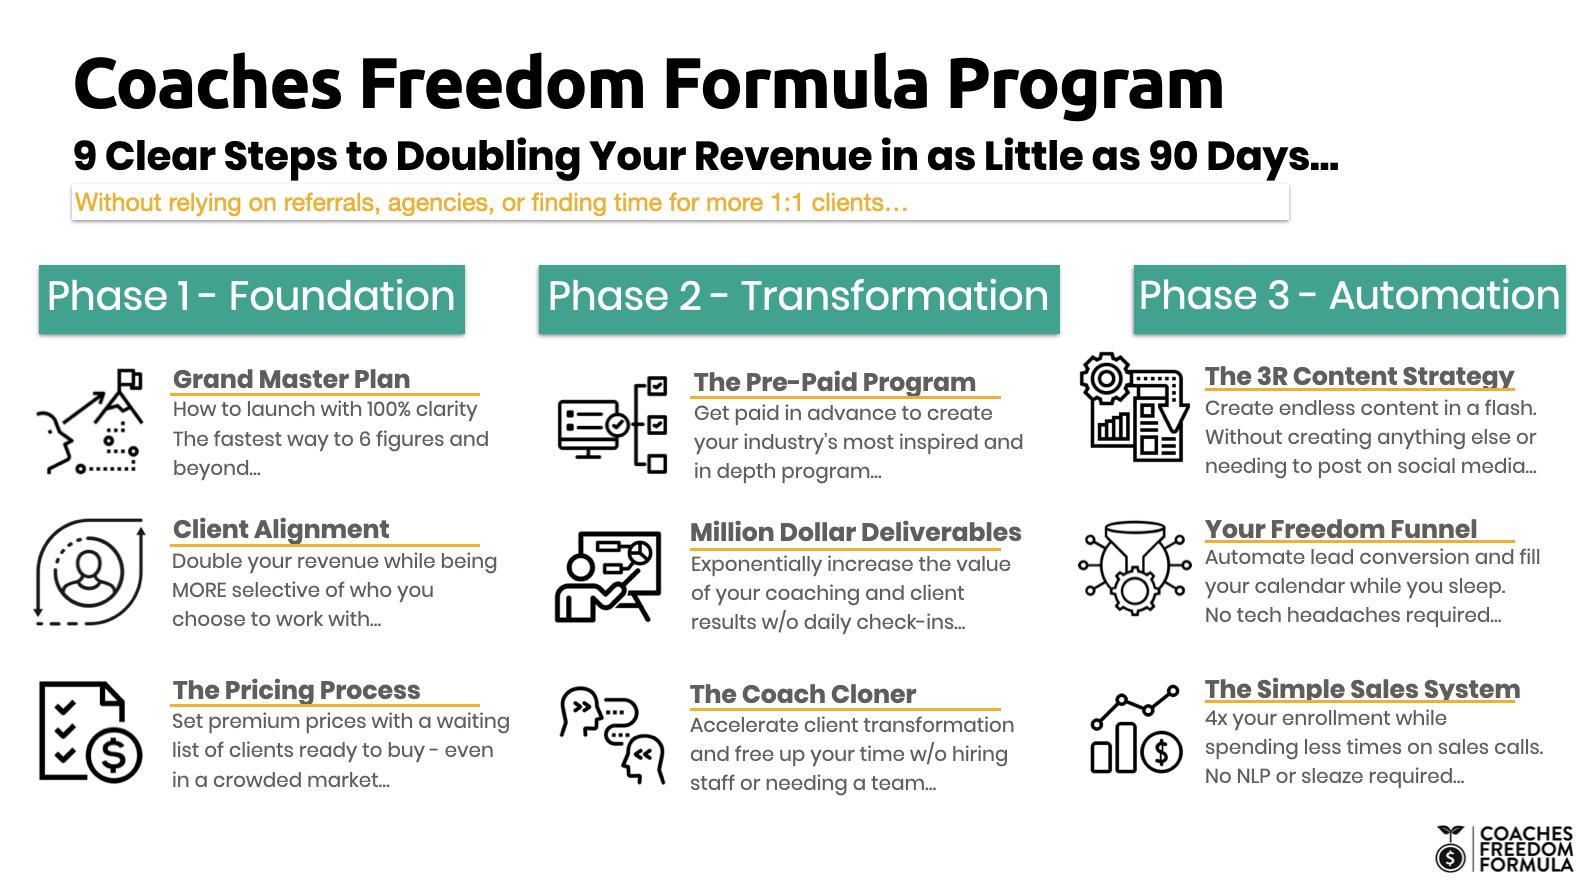 The Coaches Freedom Formula